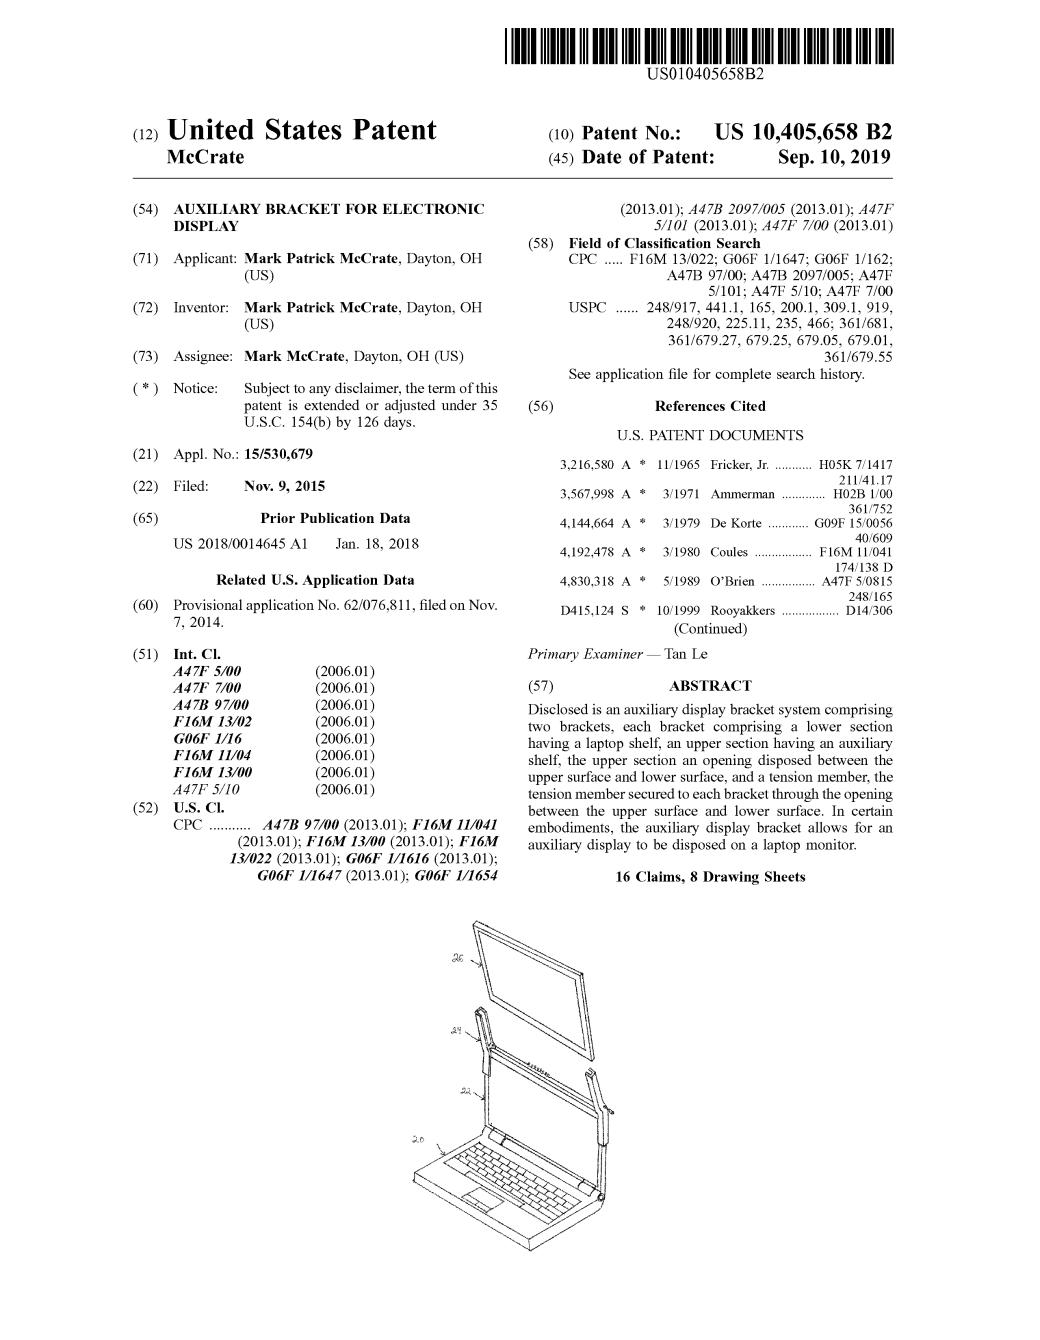 Patent # 10,405,658